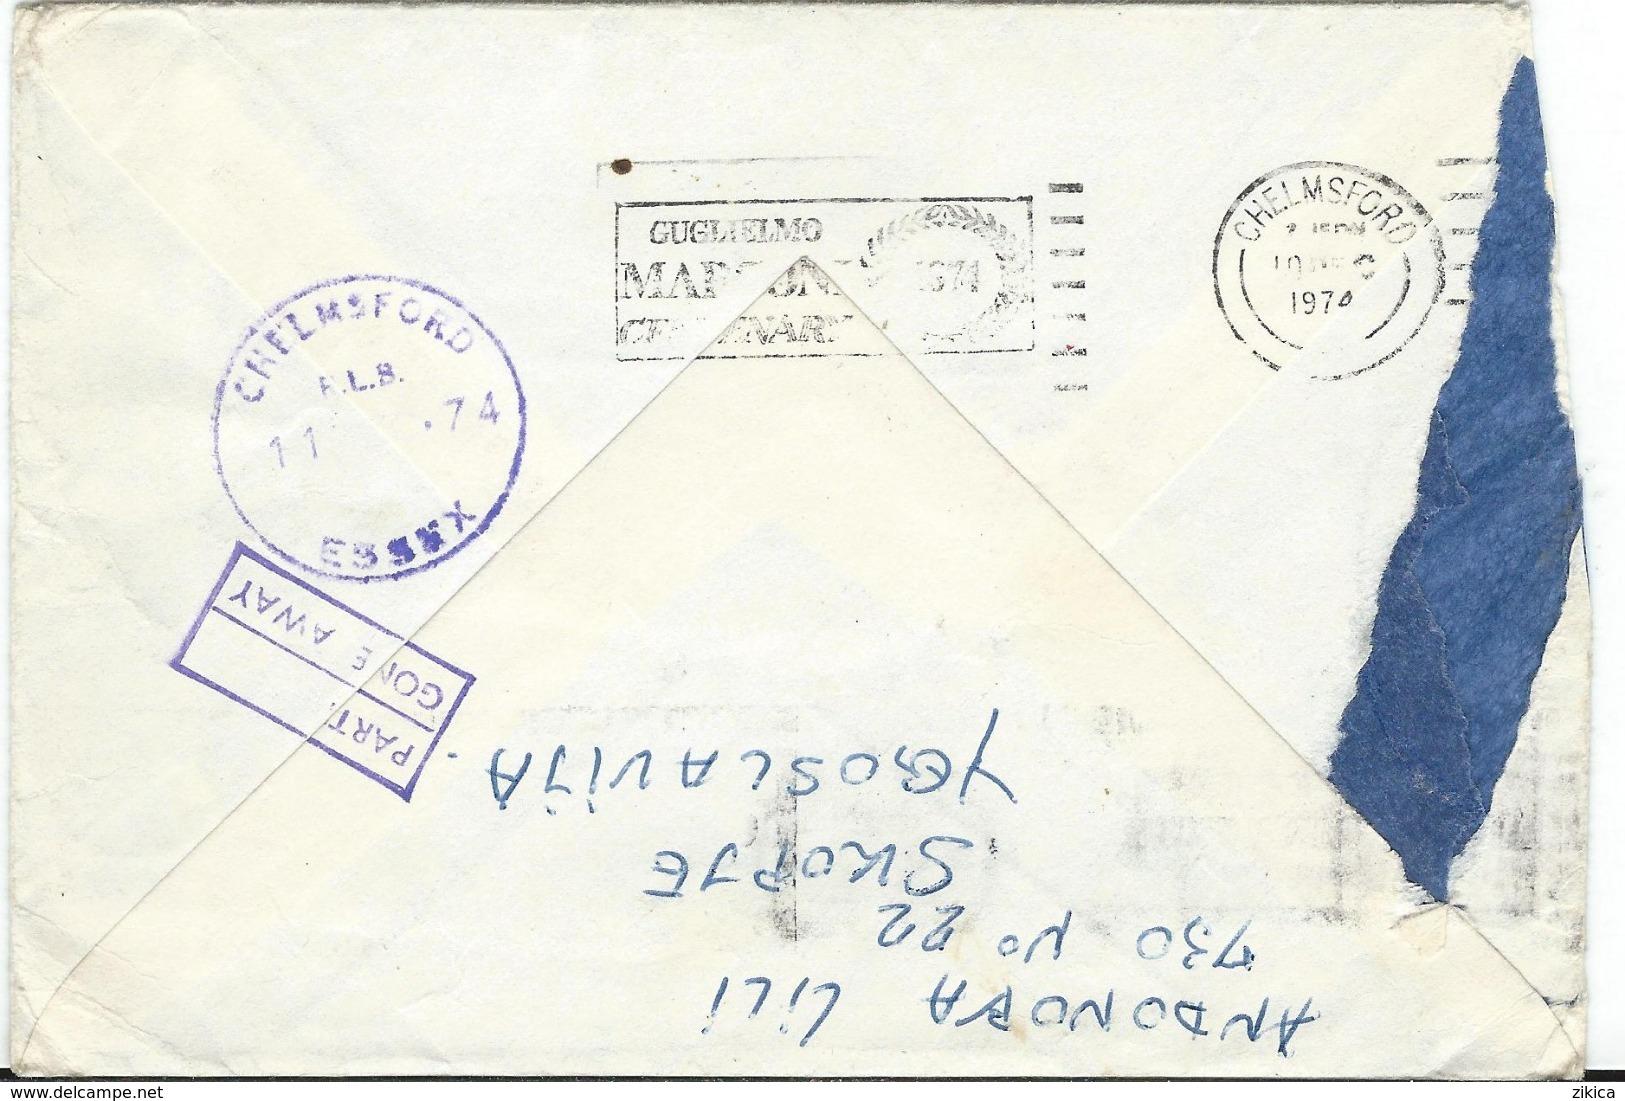 RETOUR Letter 1974 - Skopje Via Chelmsford - Briefe U. Dokumente